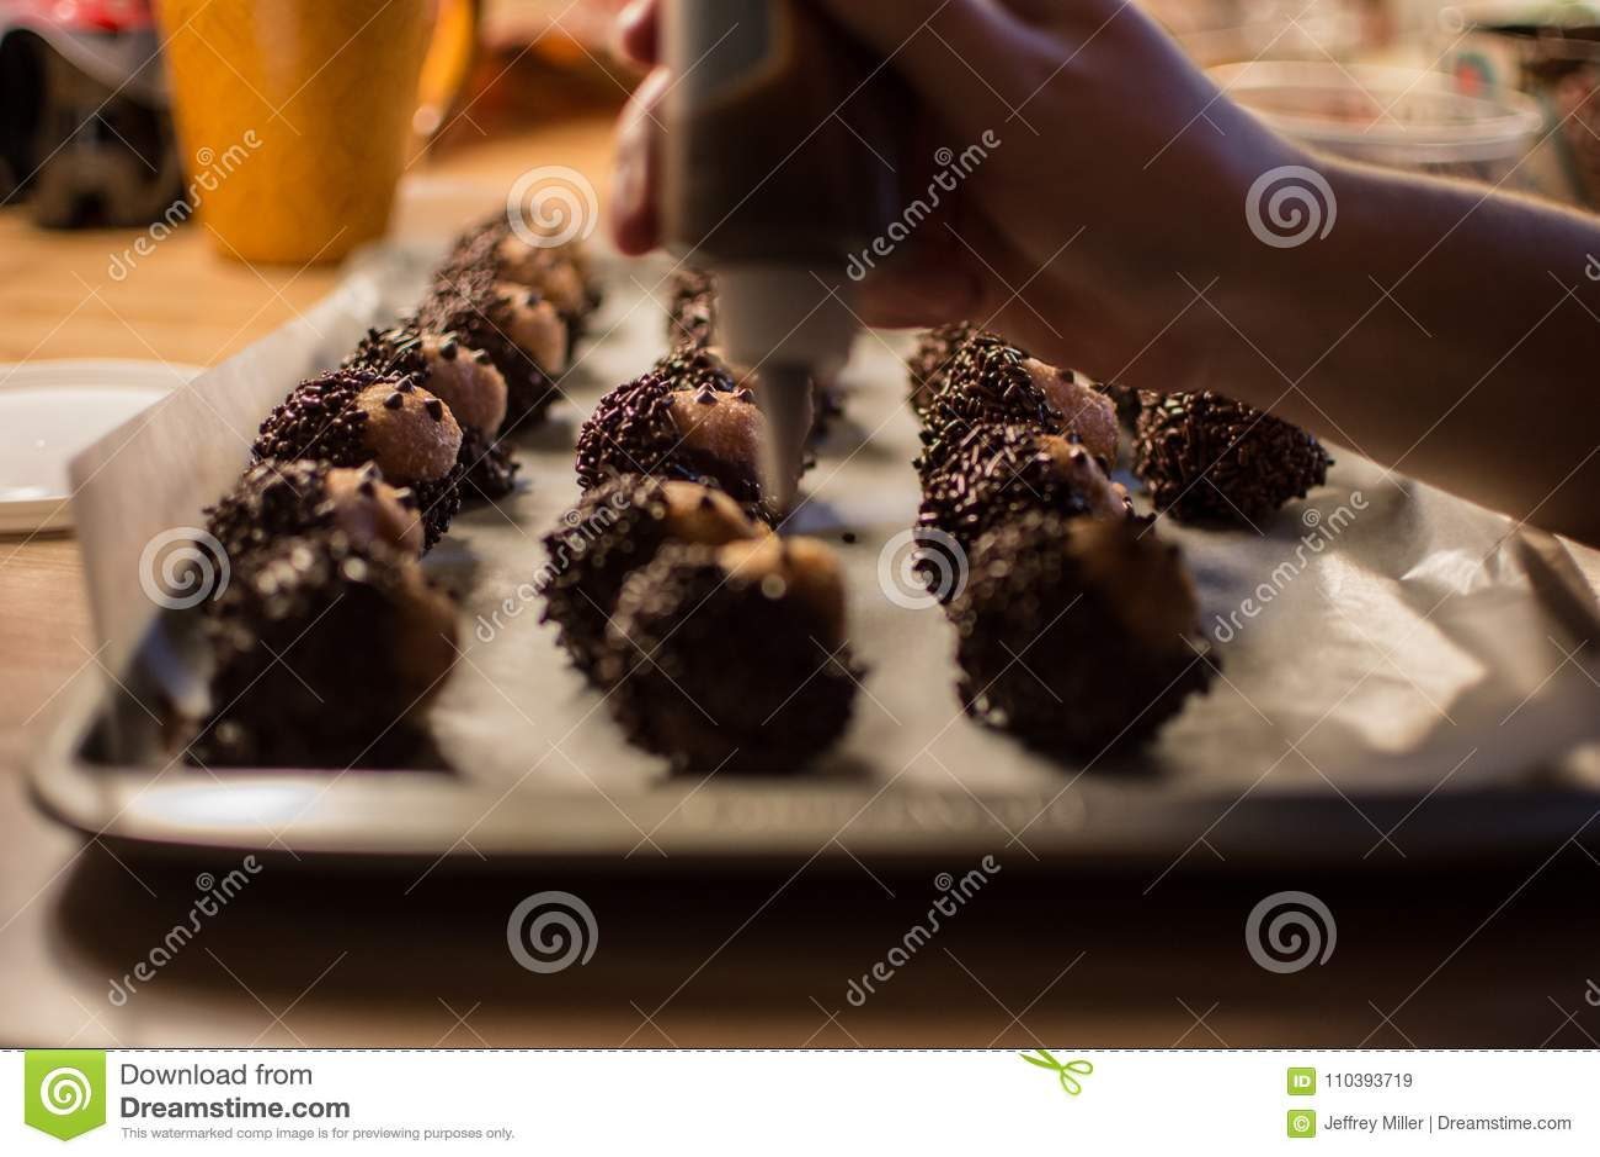 Chocolate Sprinkles On Hedgehog Doughnut Holes For A Party